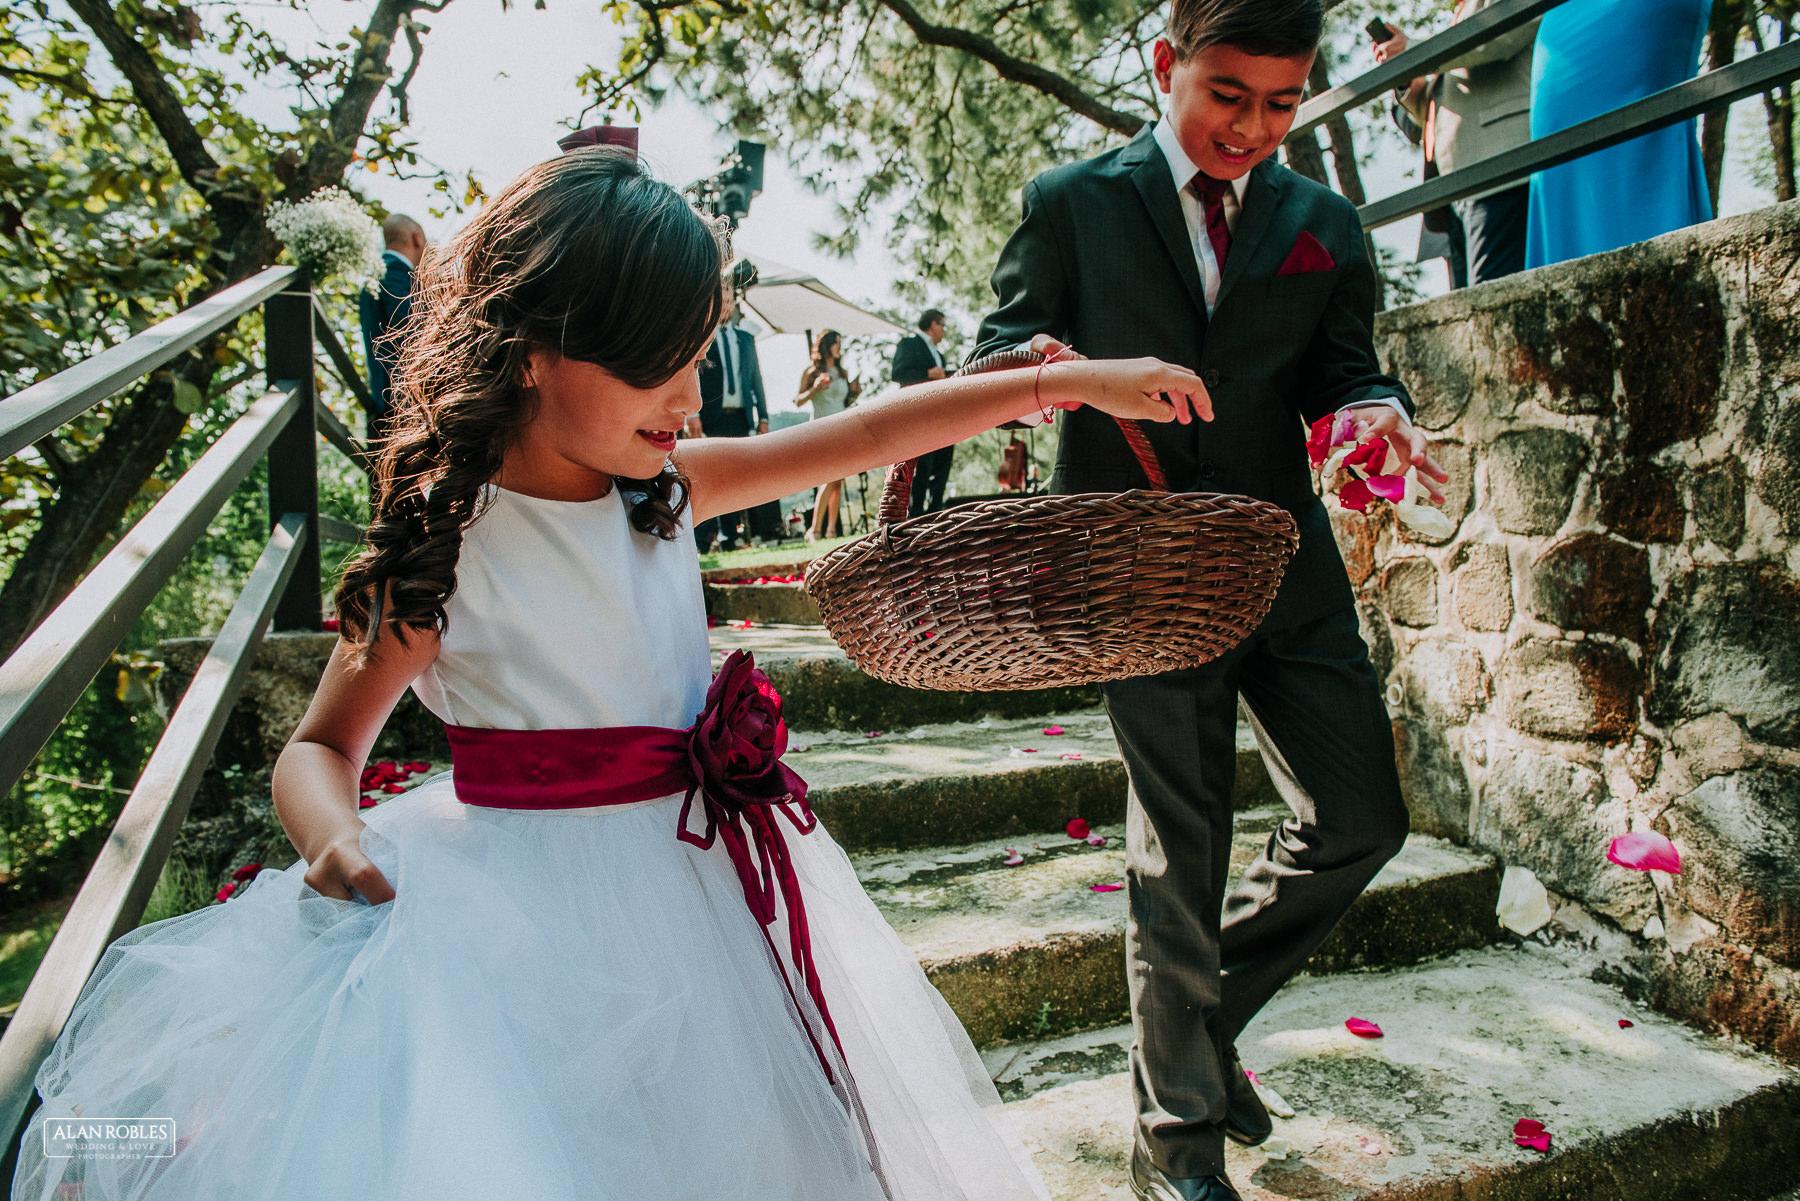 Fotografo de bodas guadalajara Alan Robles - Pinare terraza bistro 31